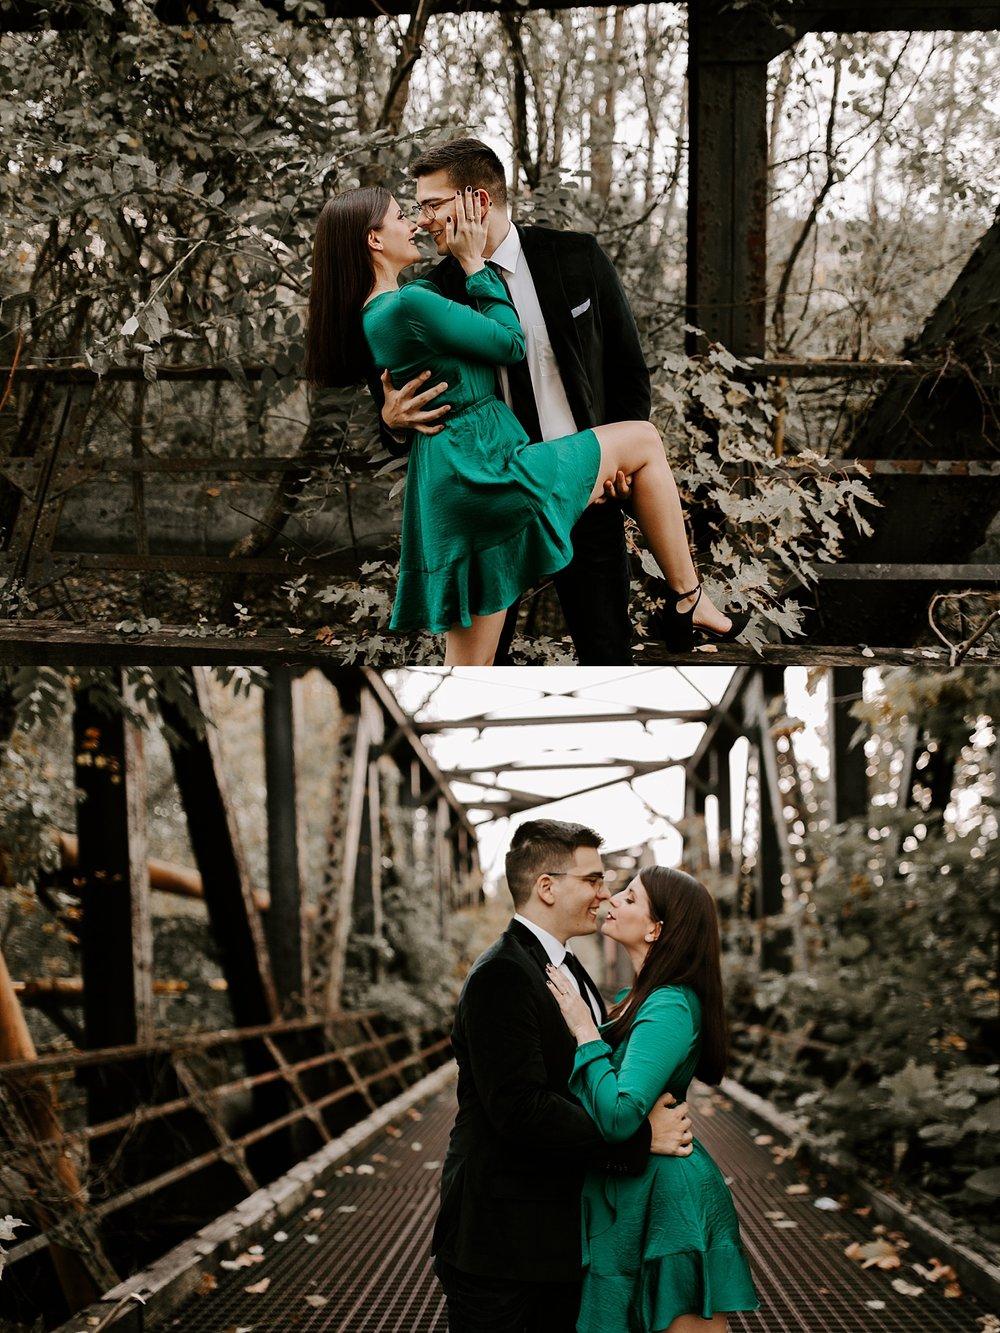 ashley_sara_photography_pittsburgh-wedding-photographer_ohio-wedding-photographer_destination-wedding-photographer29.jpg